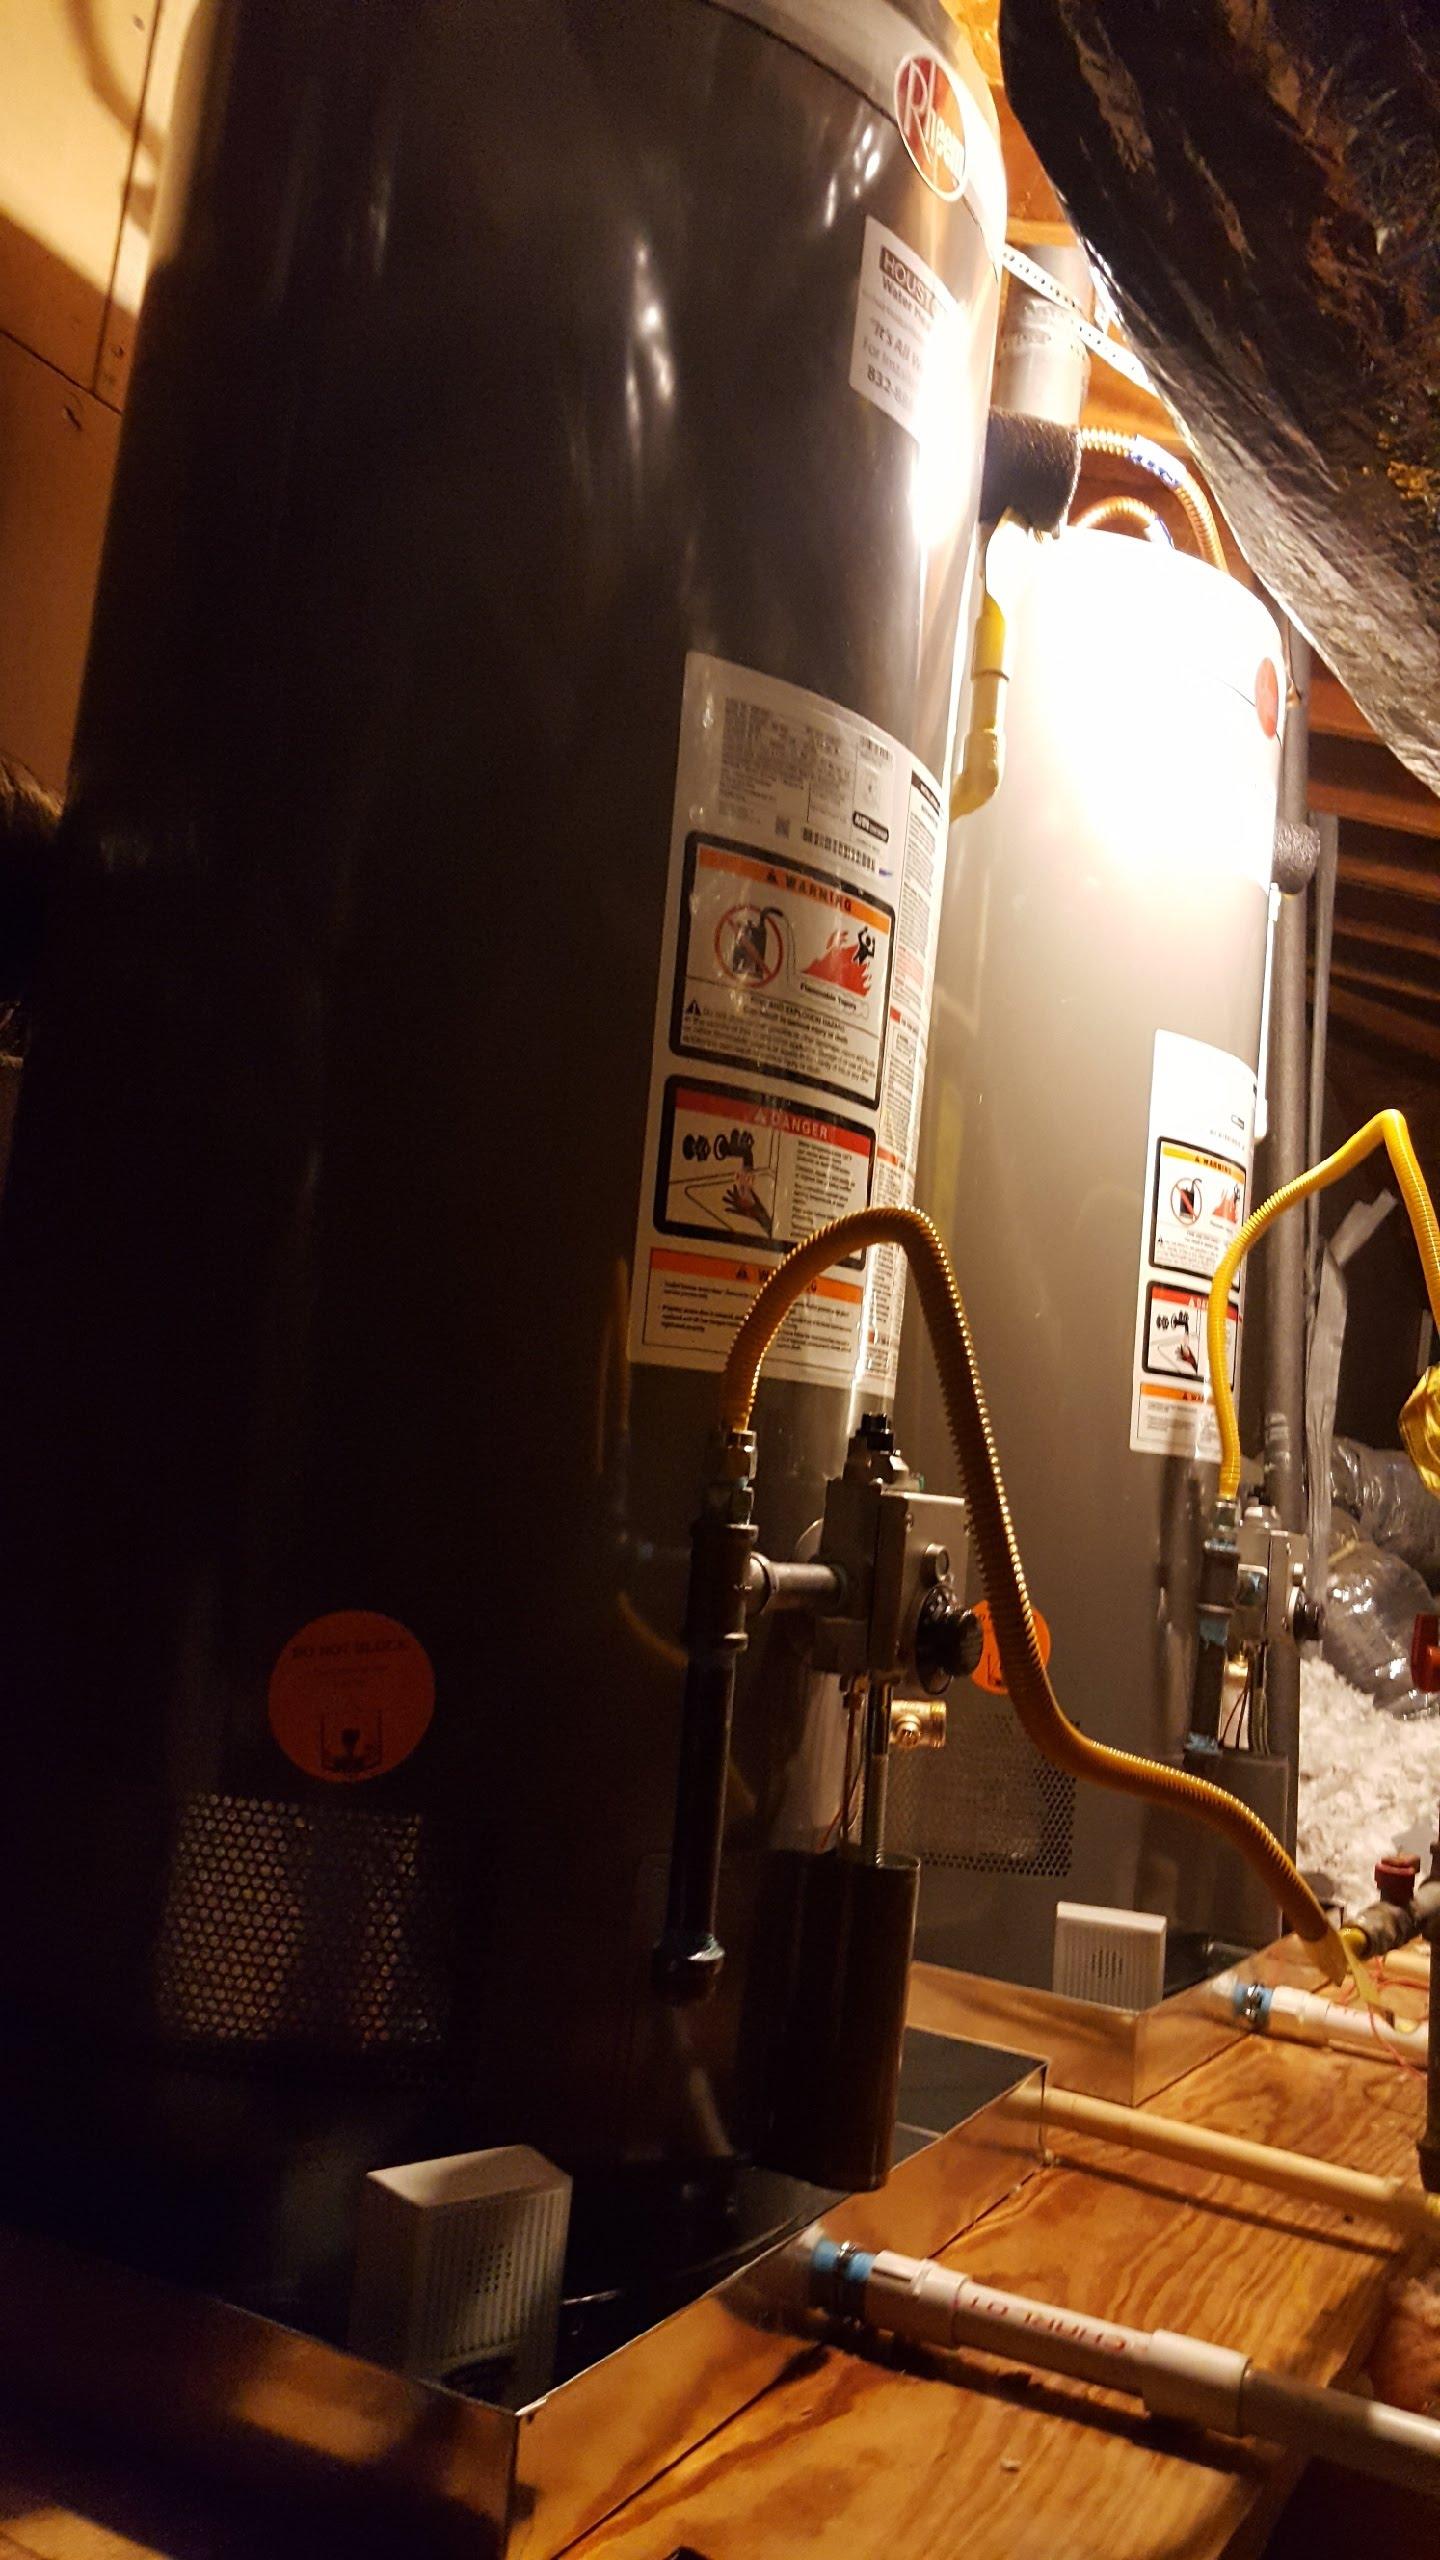 Katy Water Heaters image 86